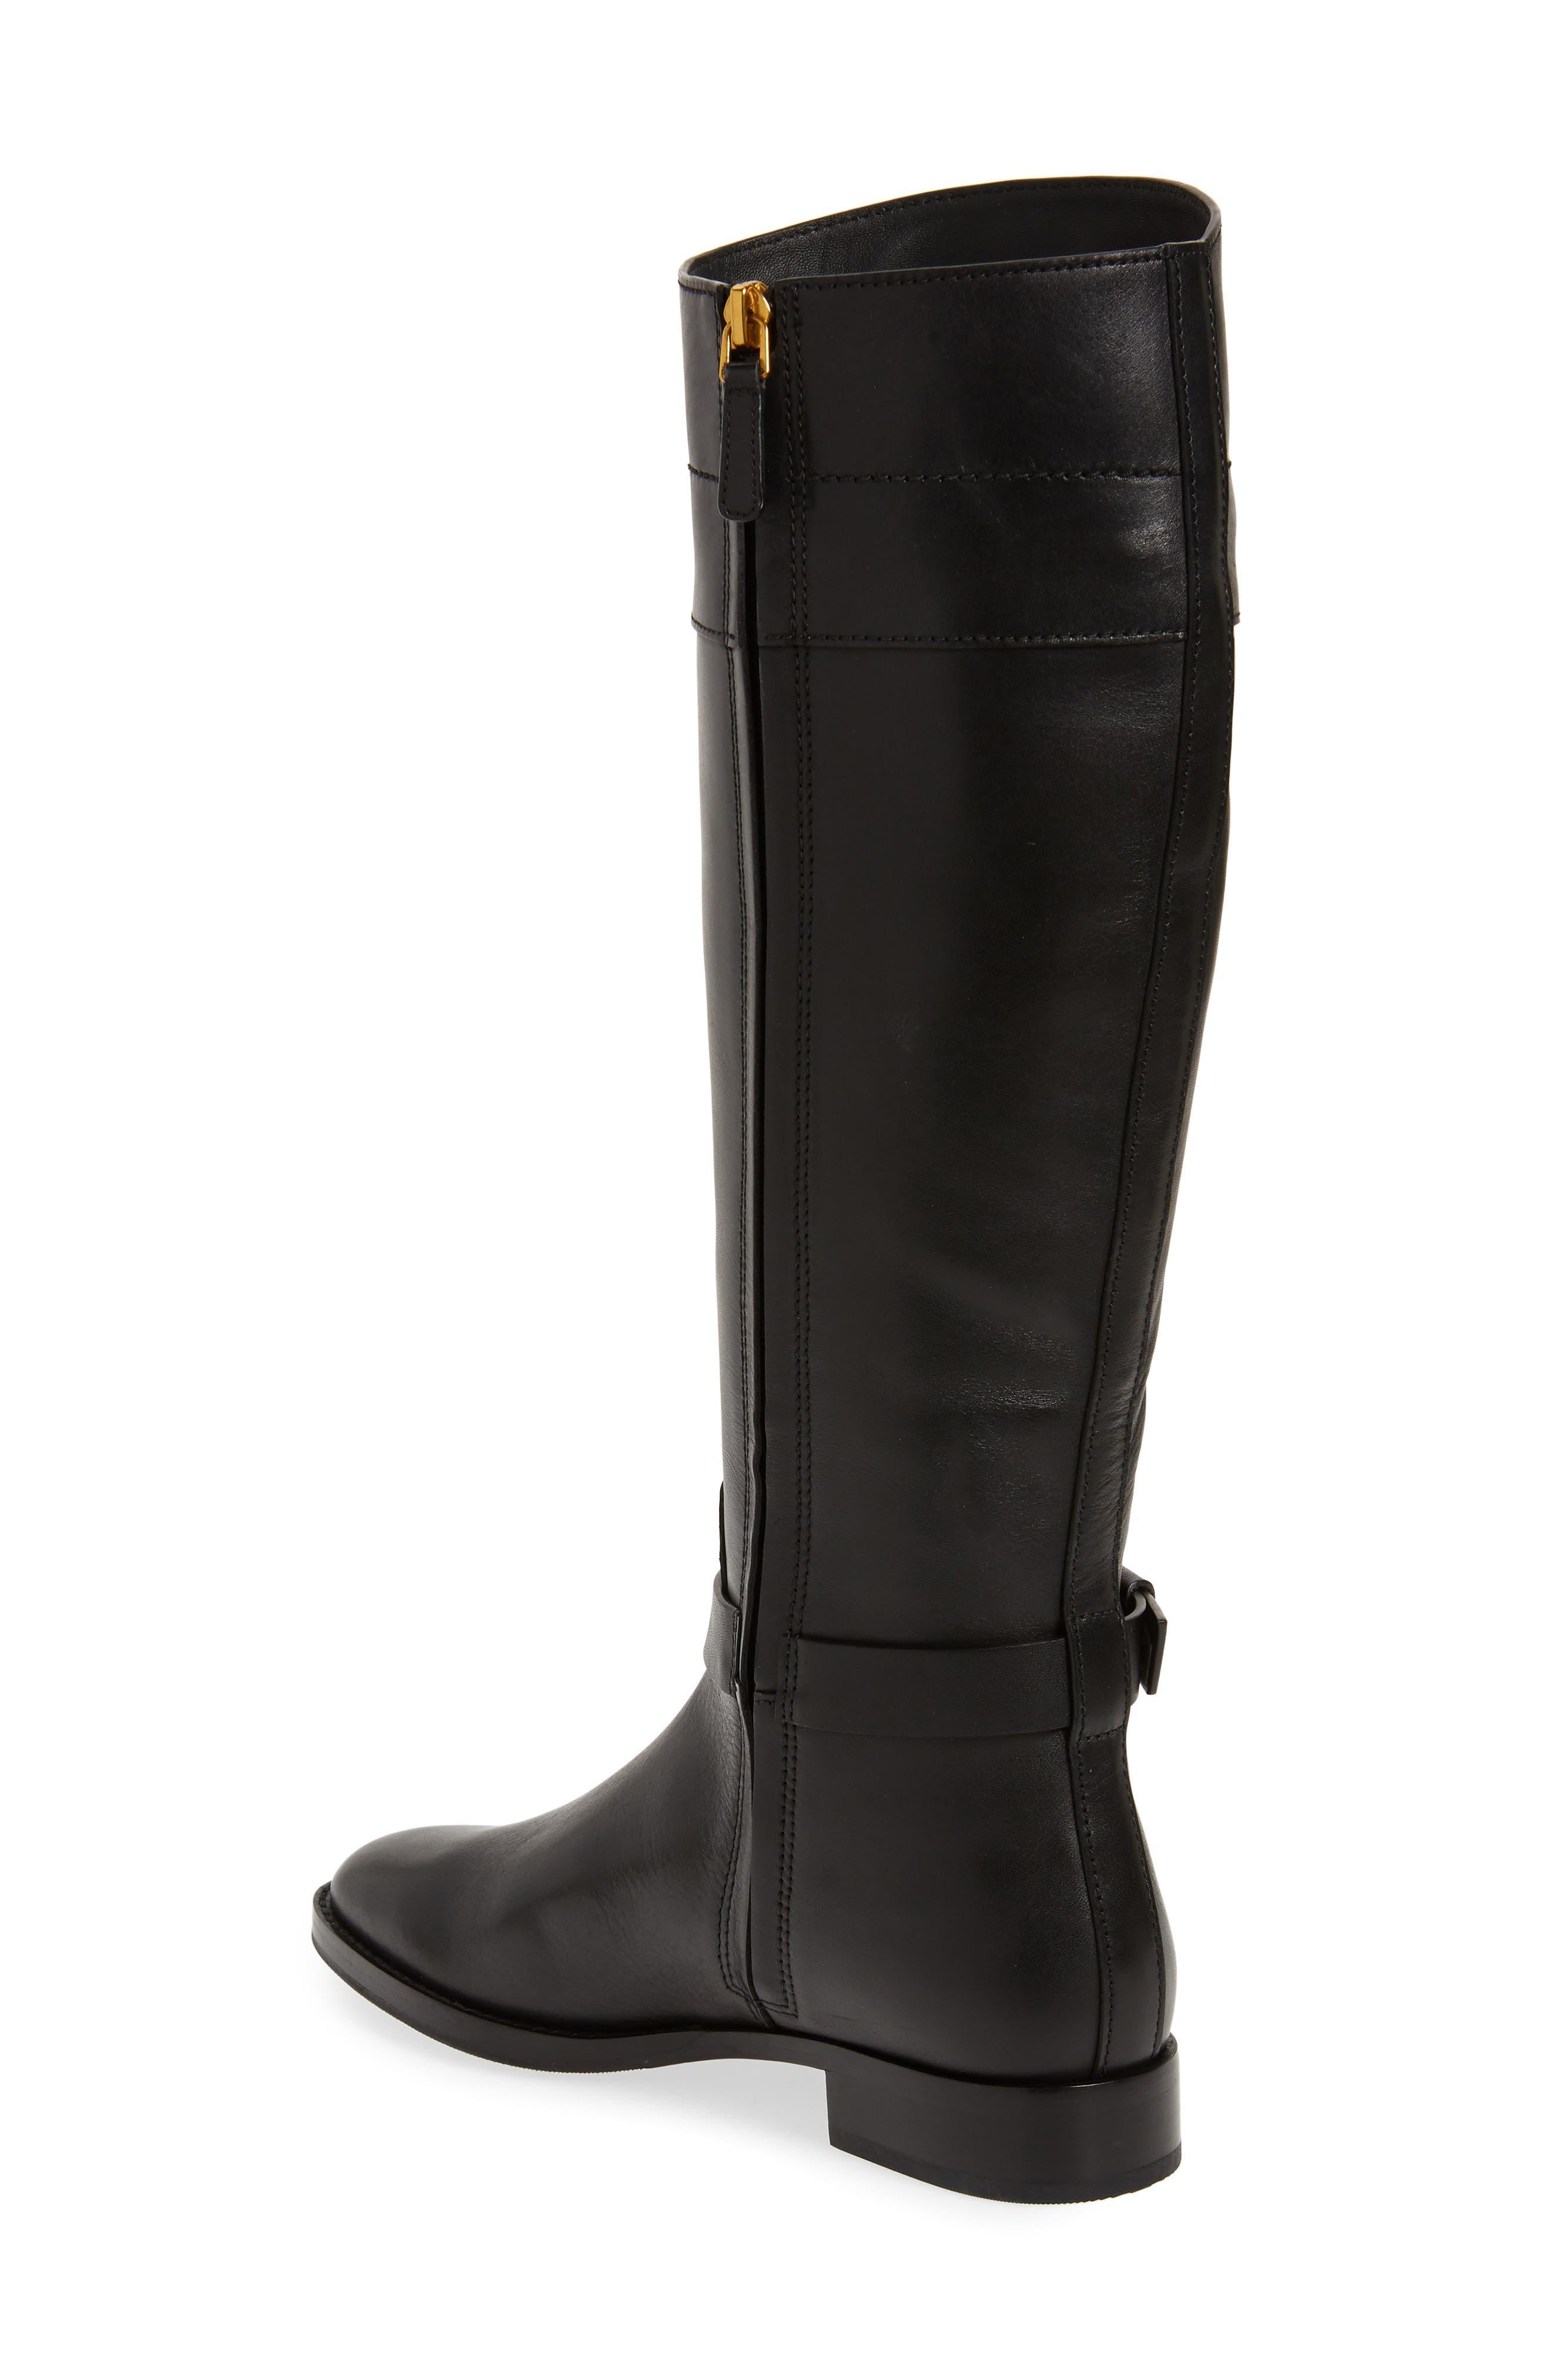 Tory Burch | Everly Knee High Boot